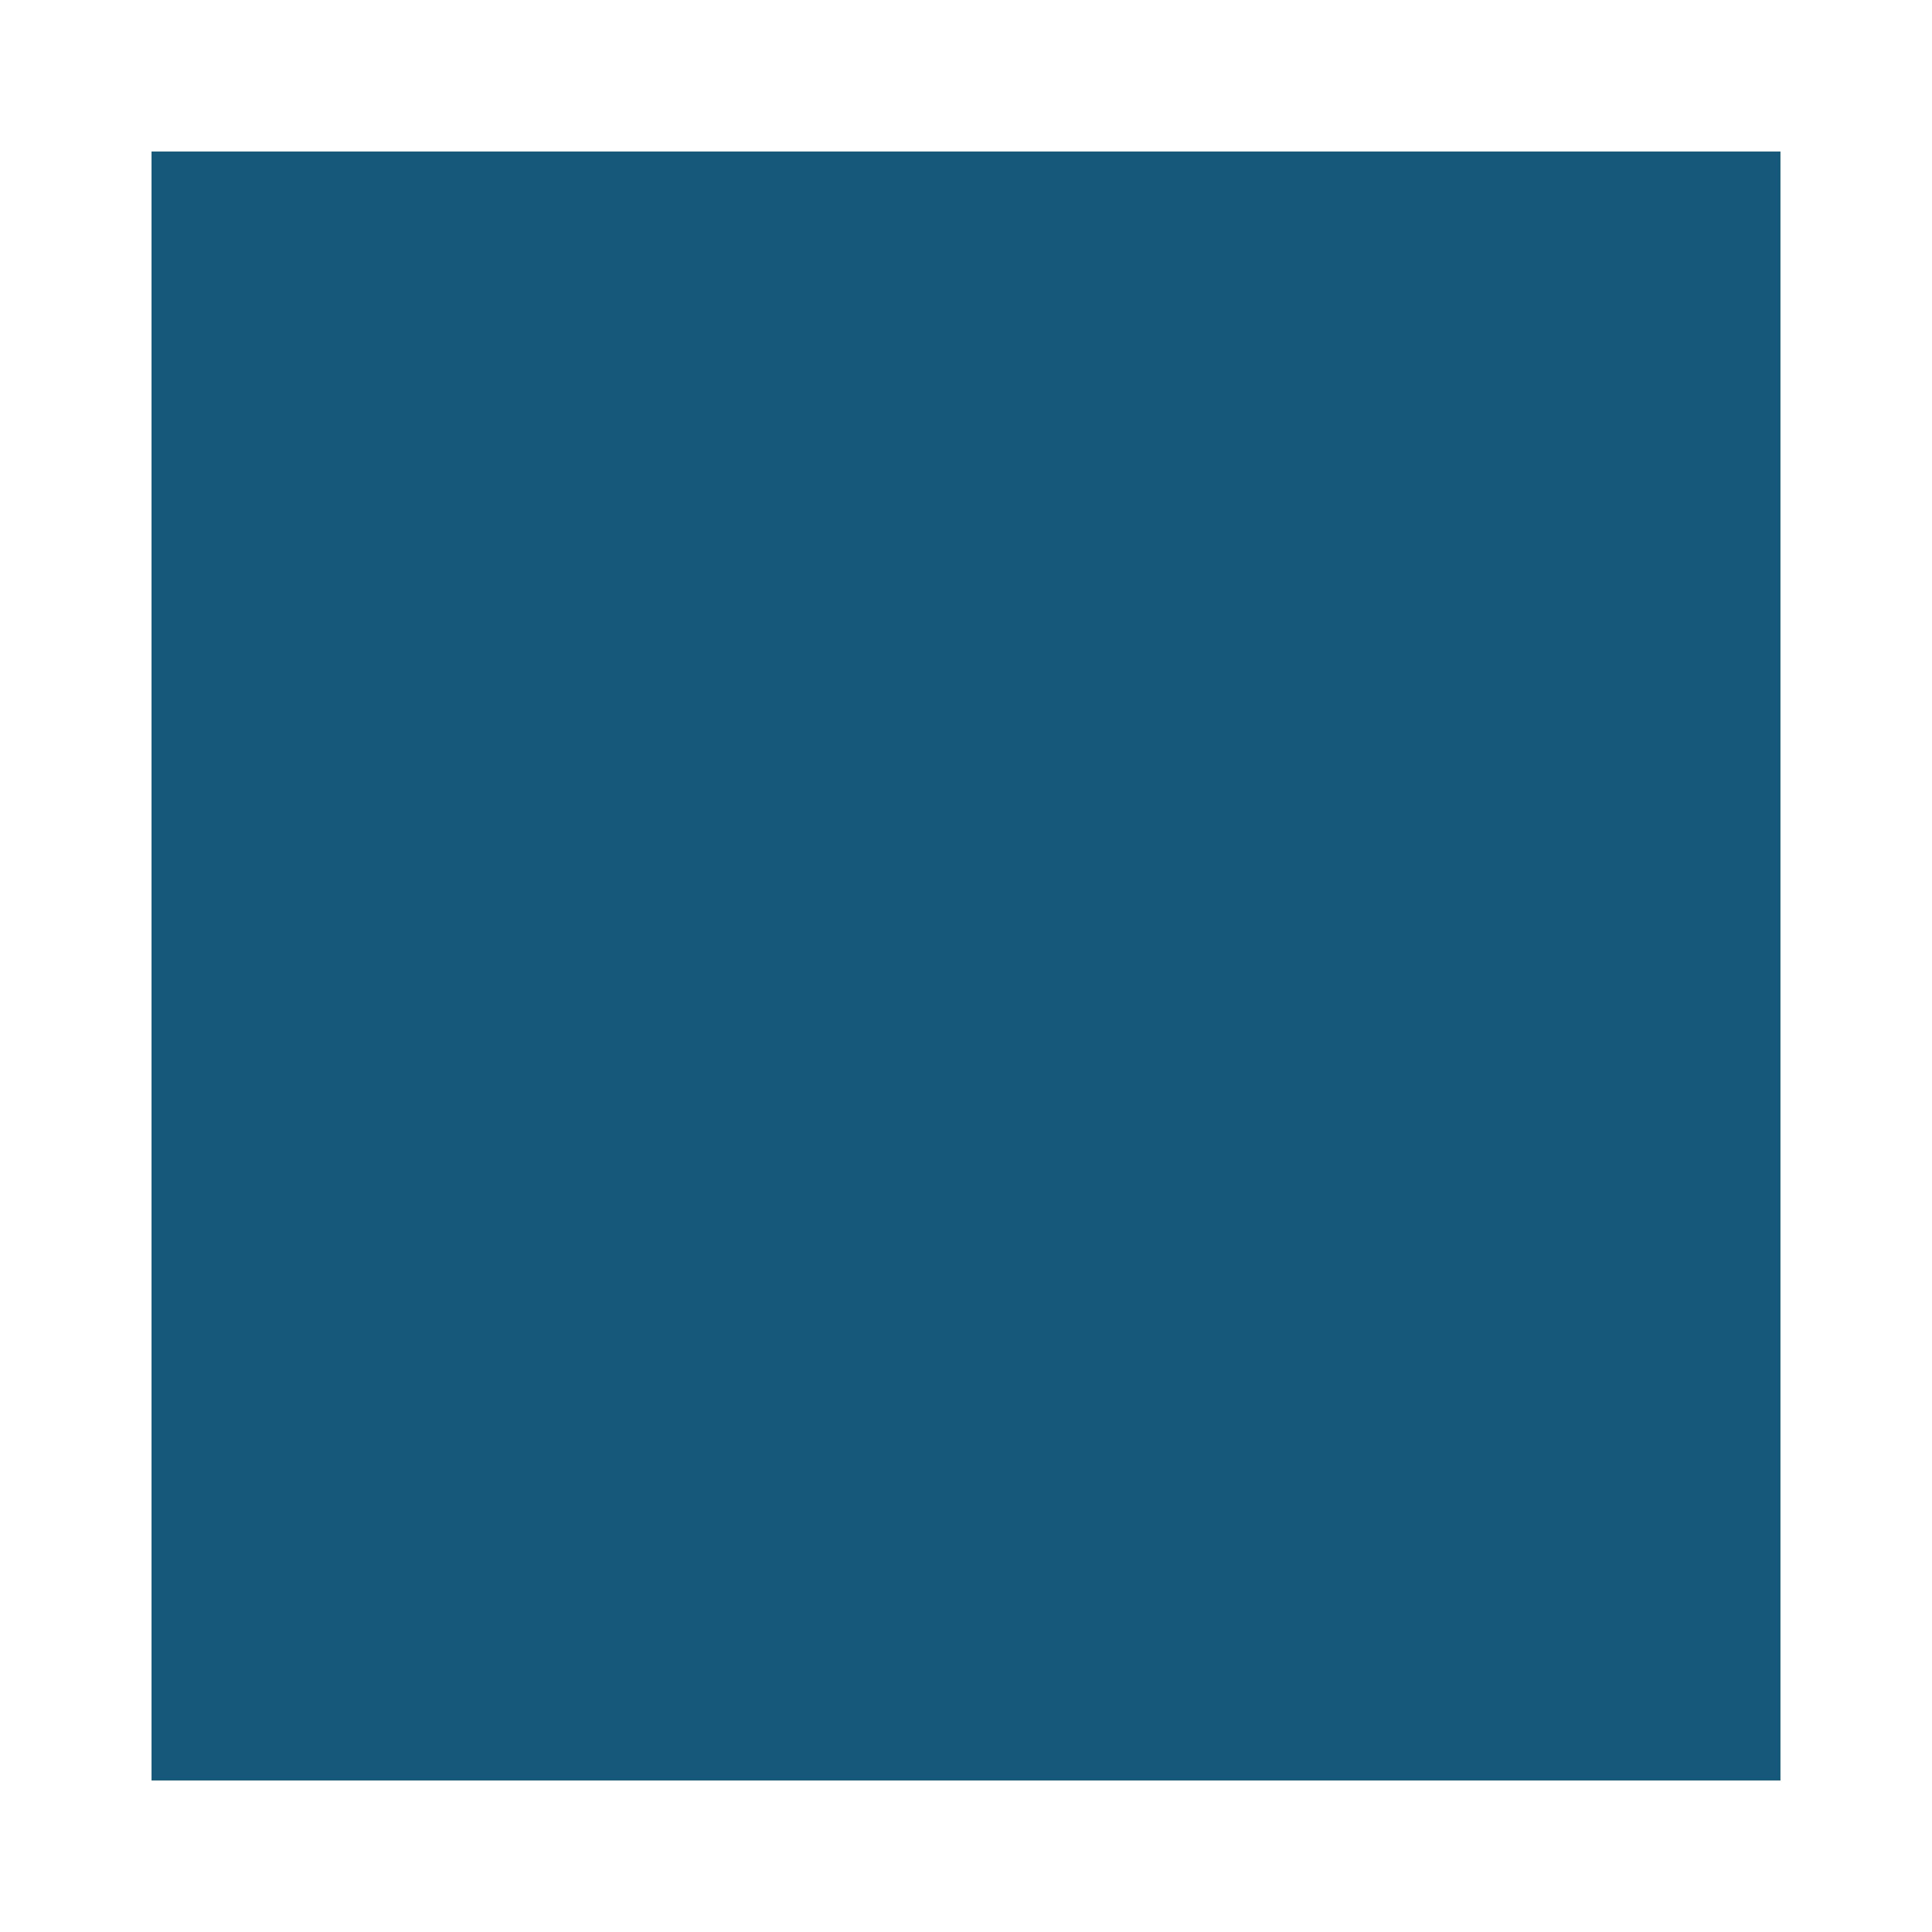 FRANK-ARK | Frank J. Martinez Arquitecto